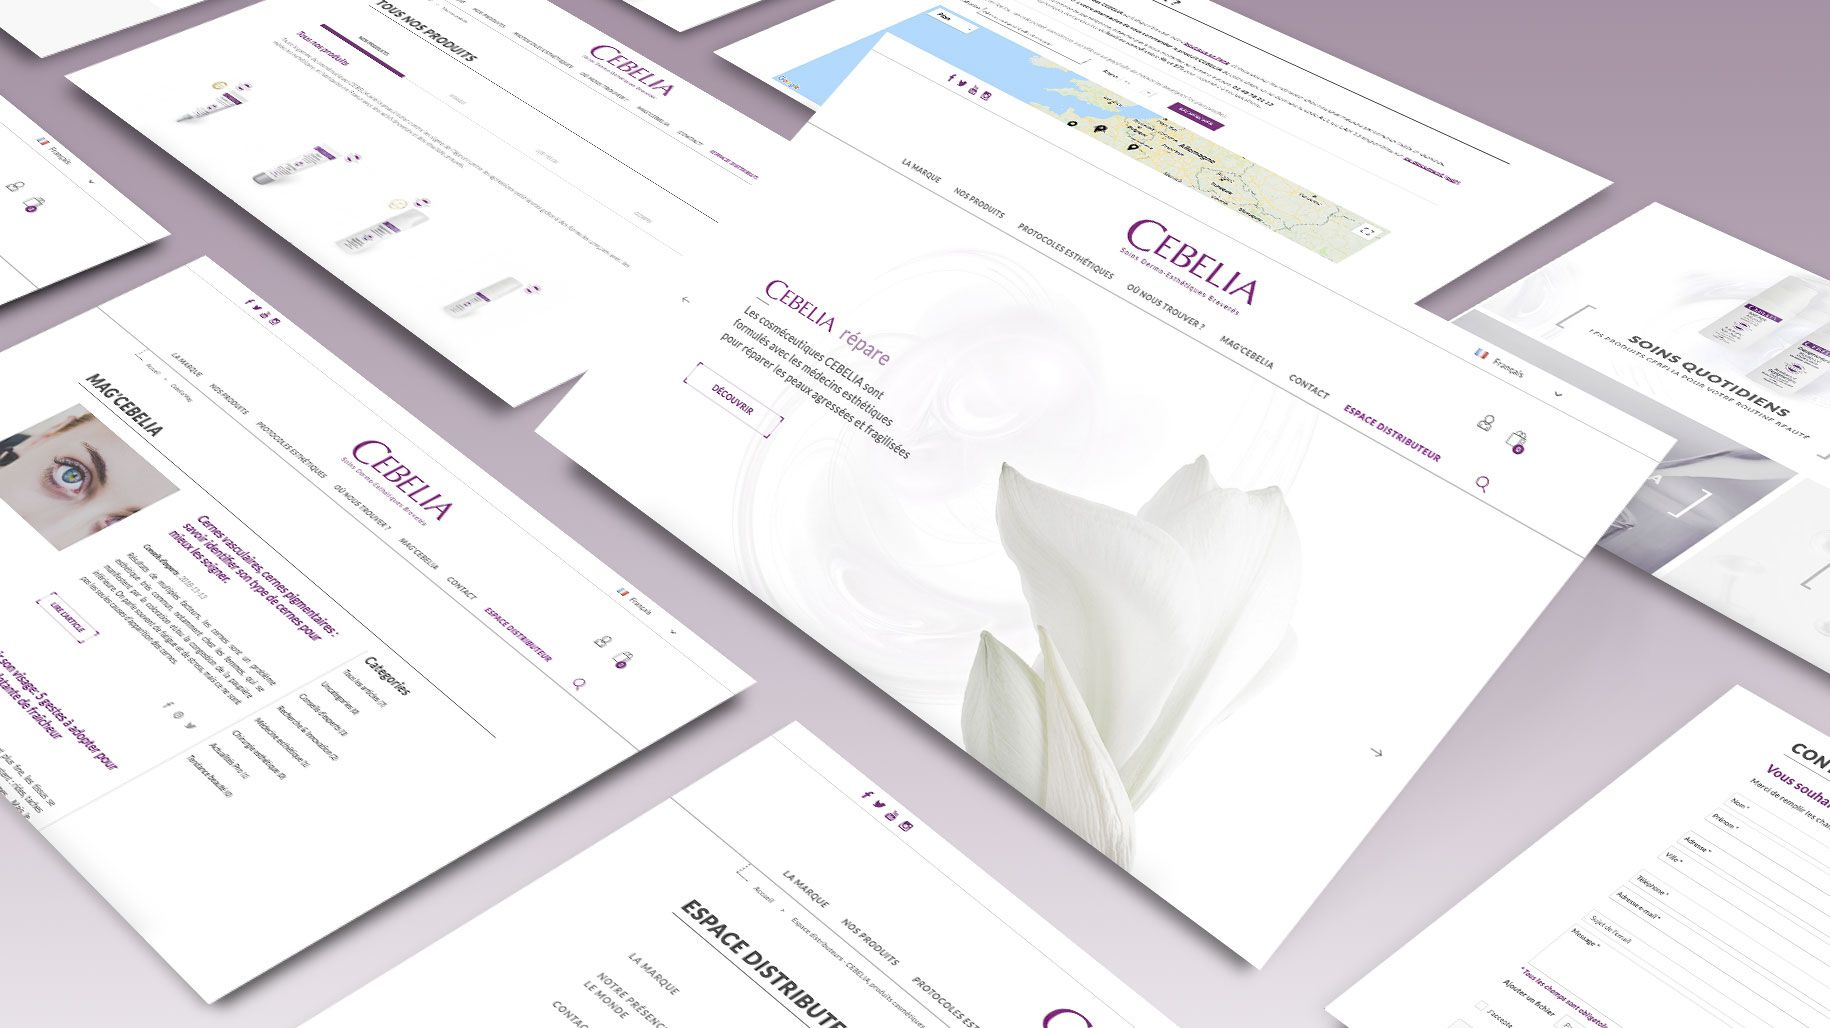 CEBELIA : Refonte du site internet e-commerce par Antipodes Medical